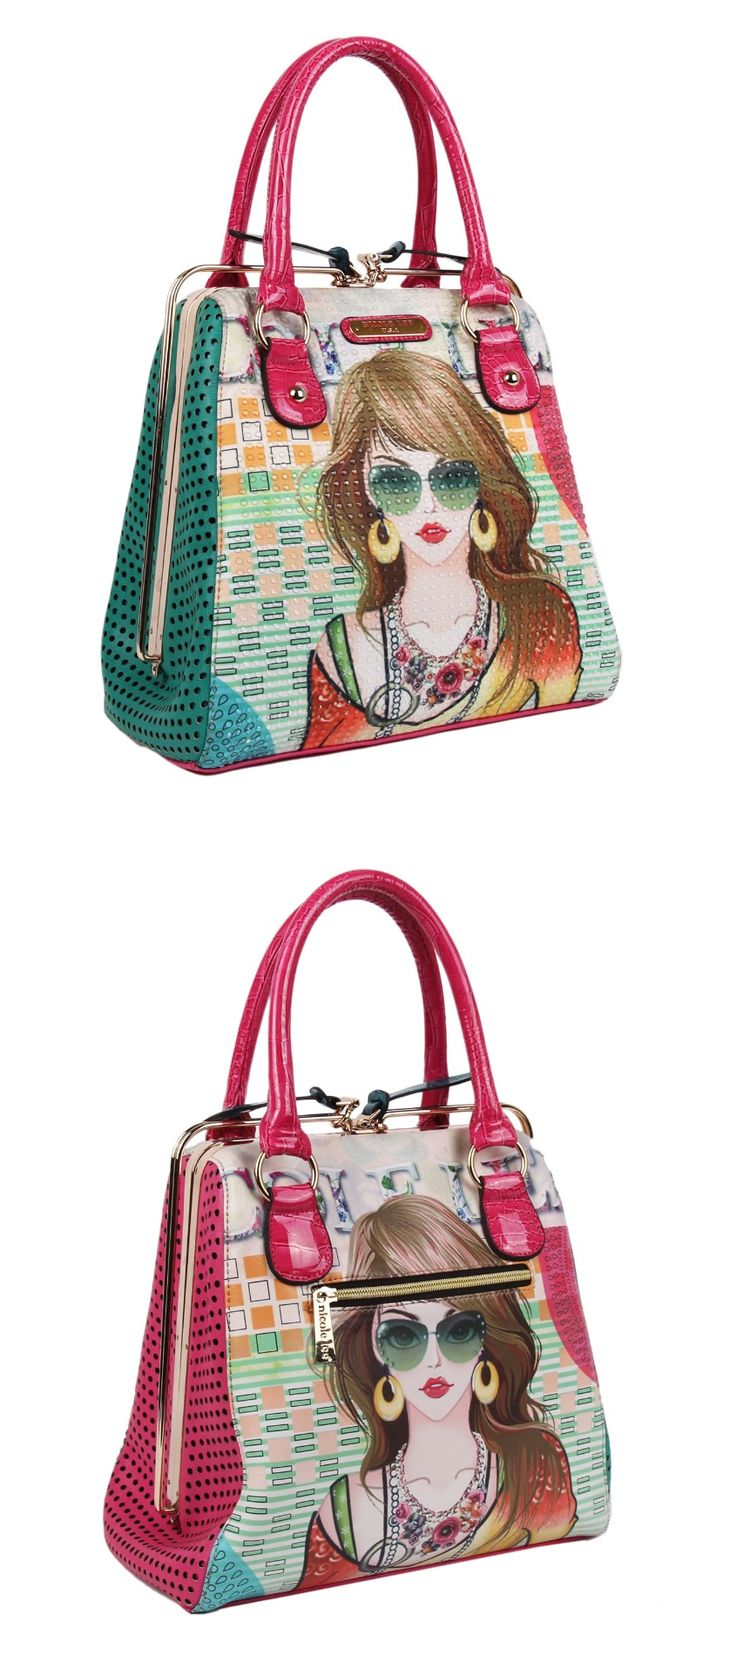 SUZY PRINT FRAME BAG by Nicole Lee #nicolelee #purse #2014